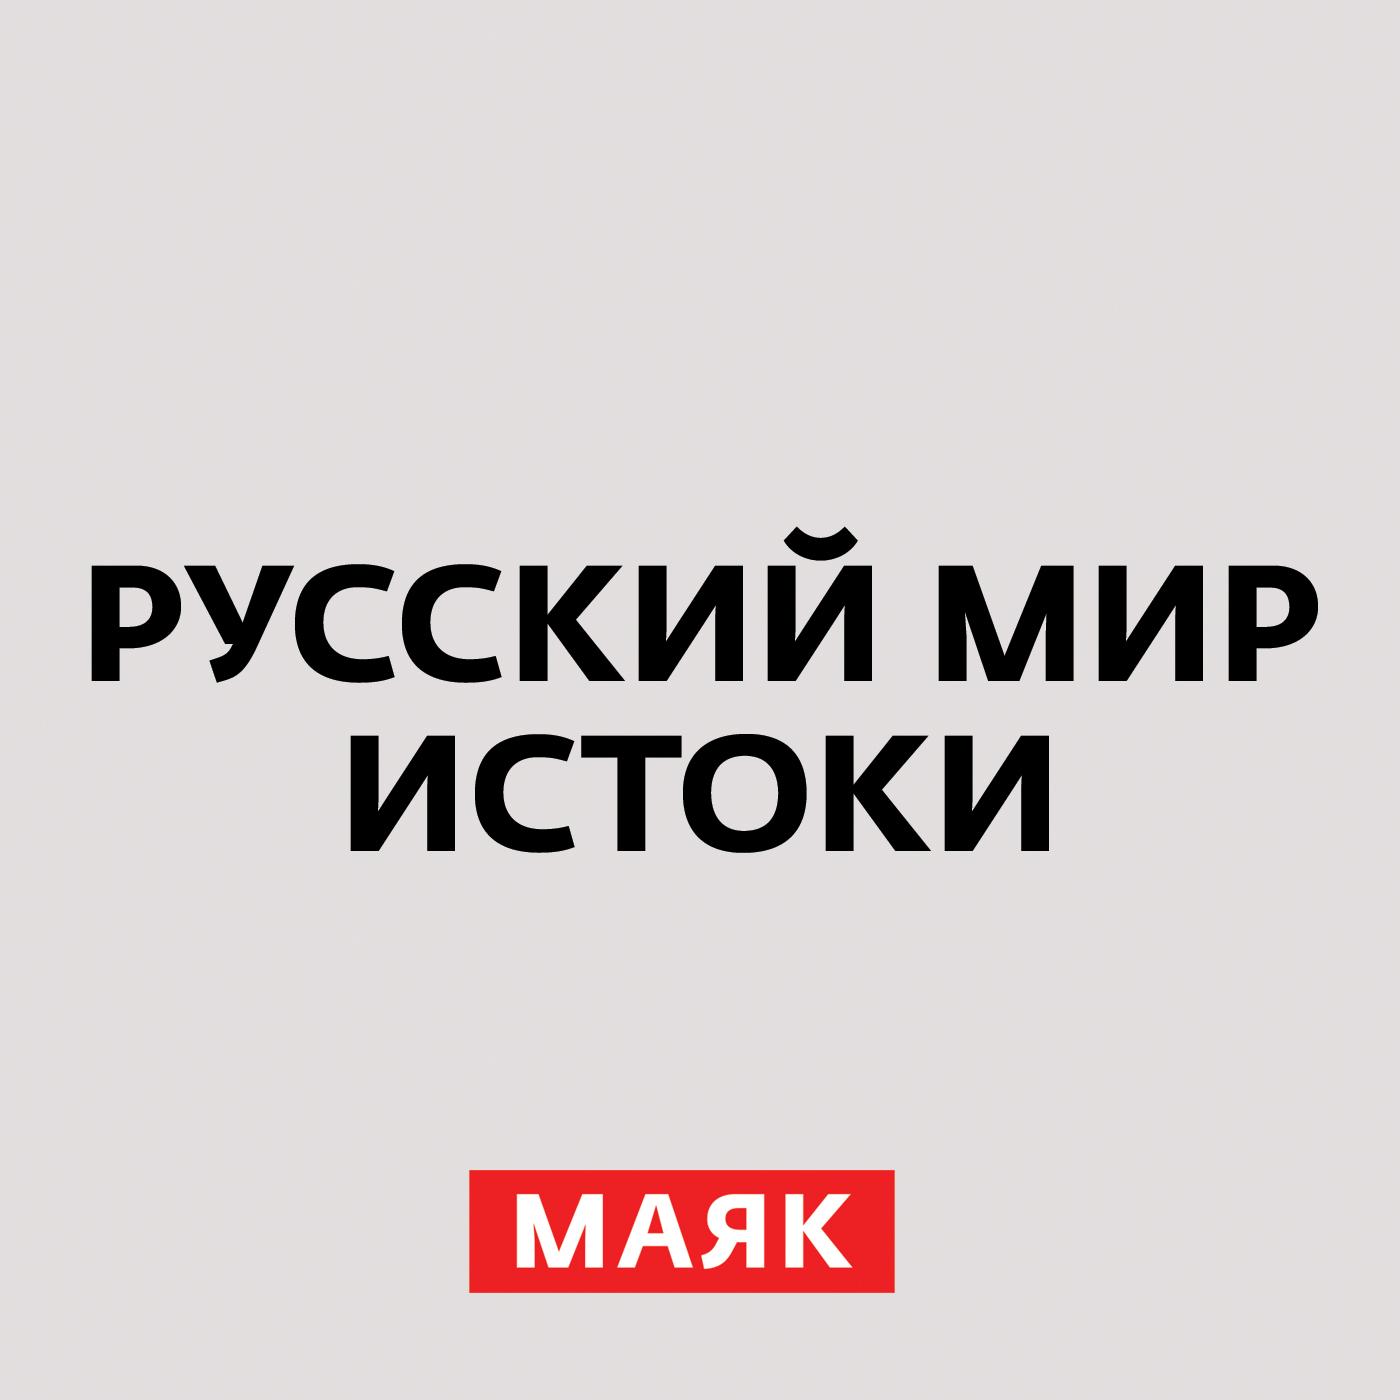 Творческий коллектив радио «Маяк» Анна Иоанновна творческий коллектив радио маяк теща